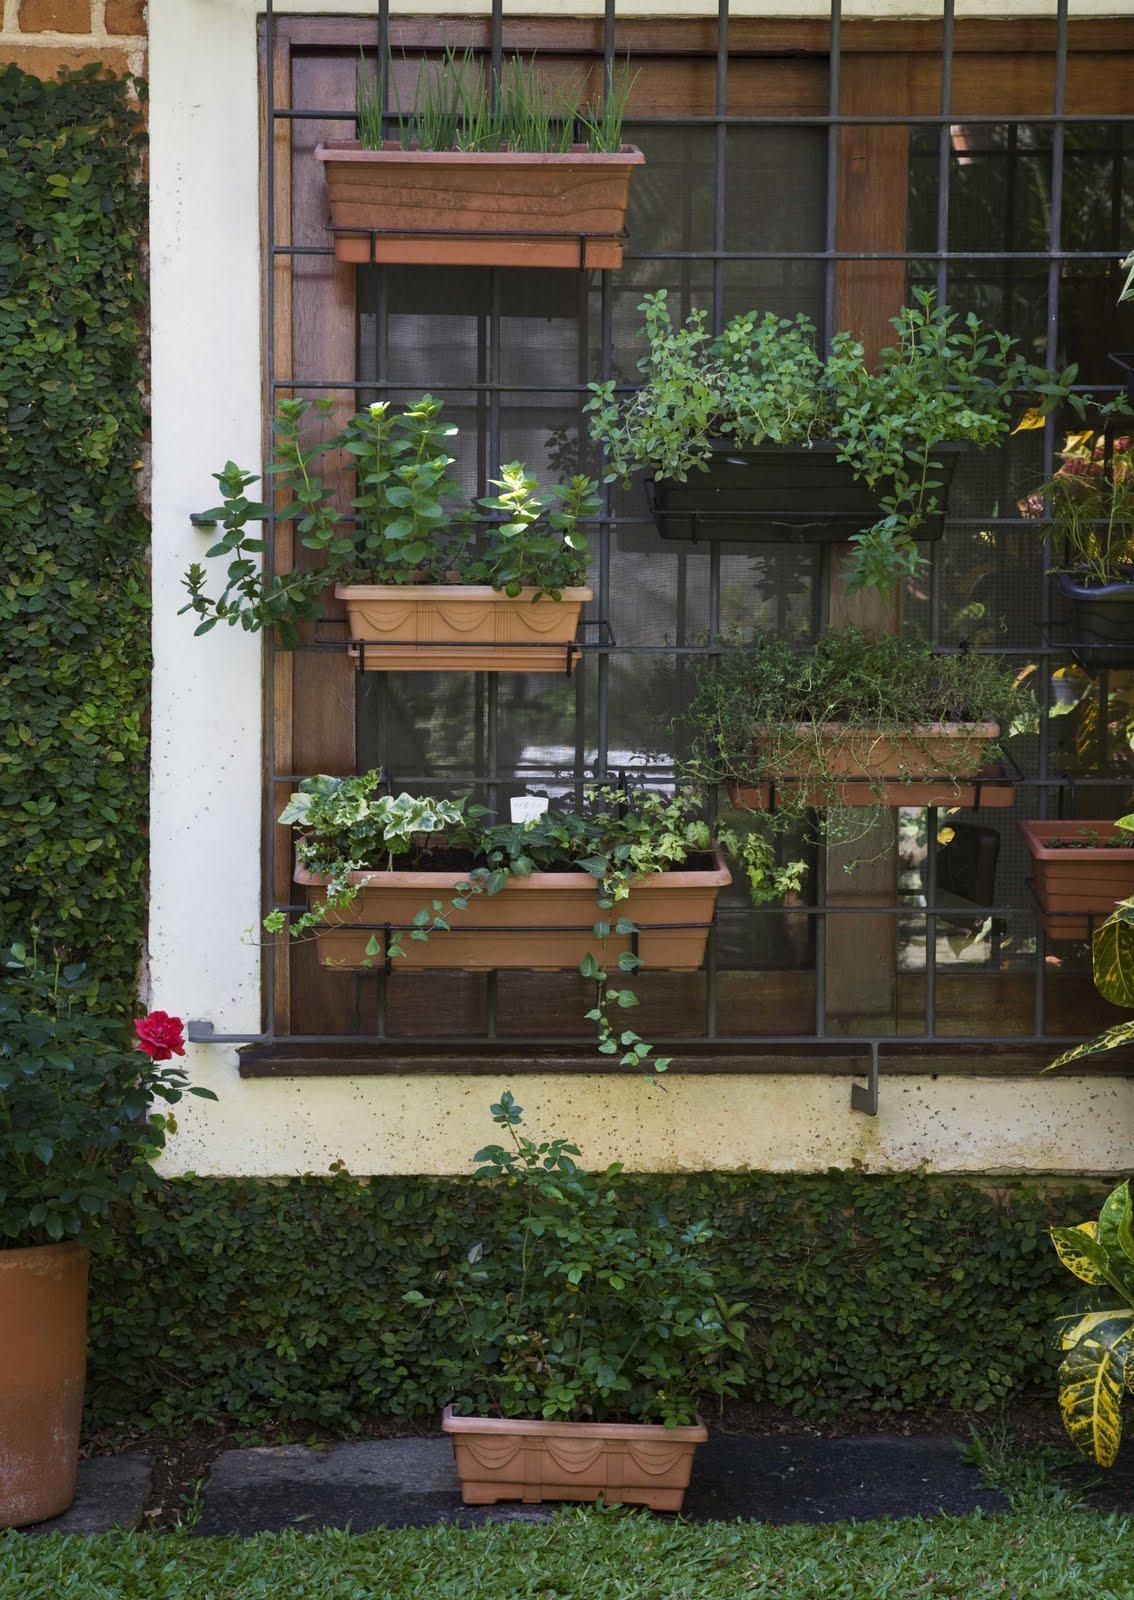 jardim vertical terraco:Lilita's World: Terraço da Valda!